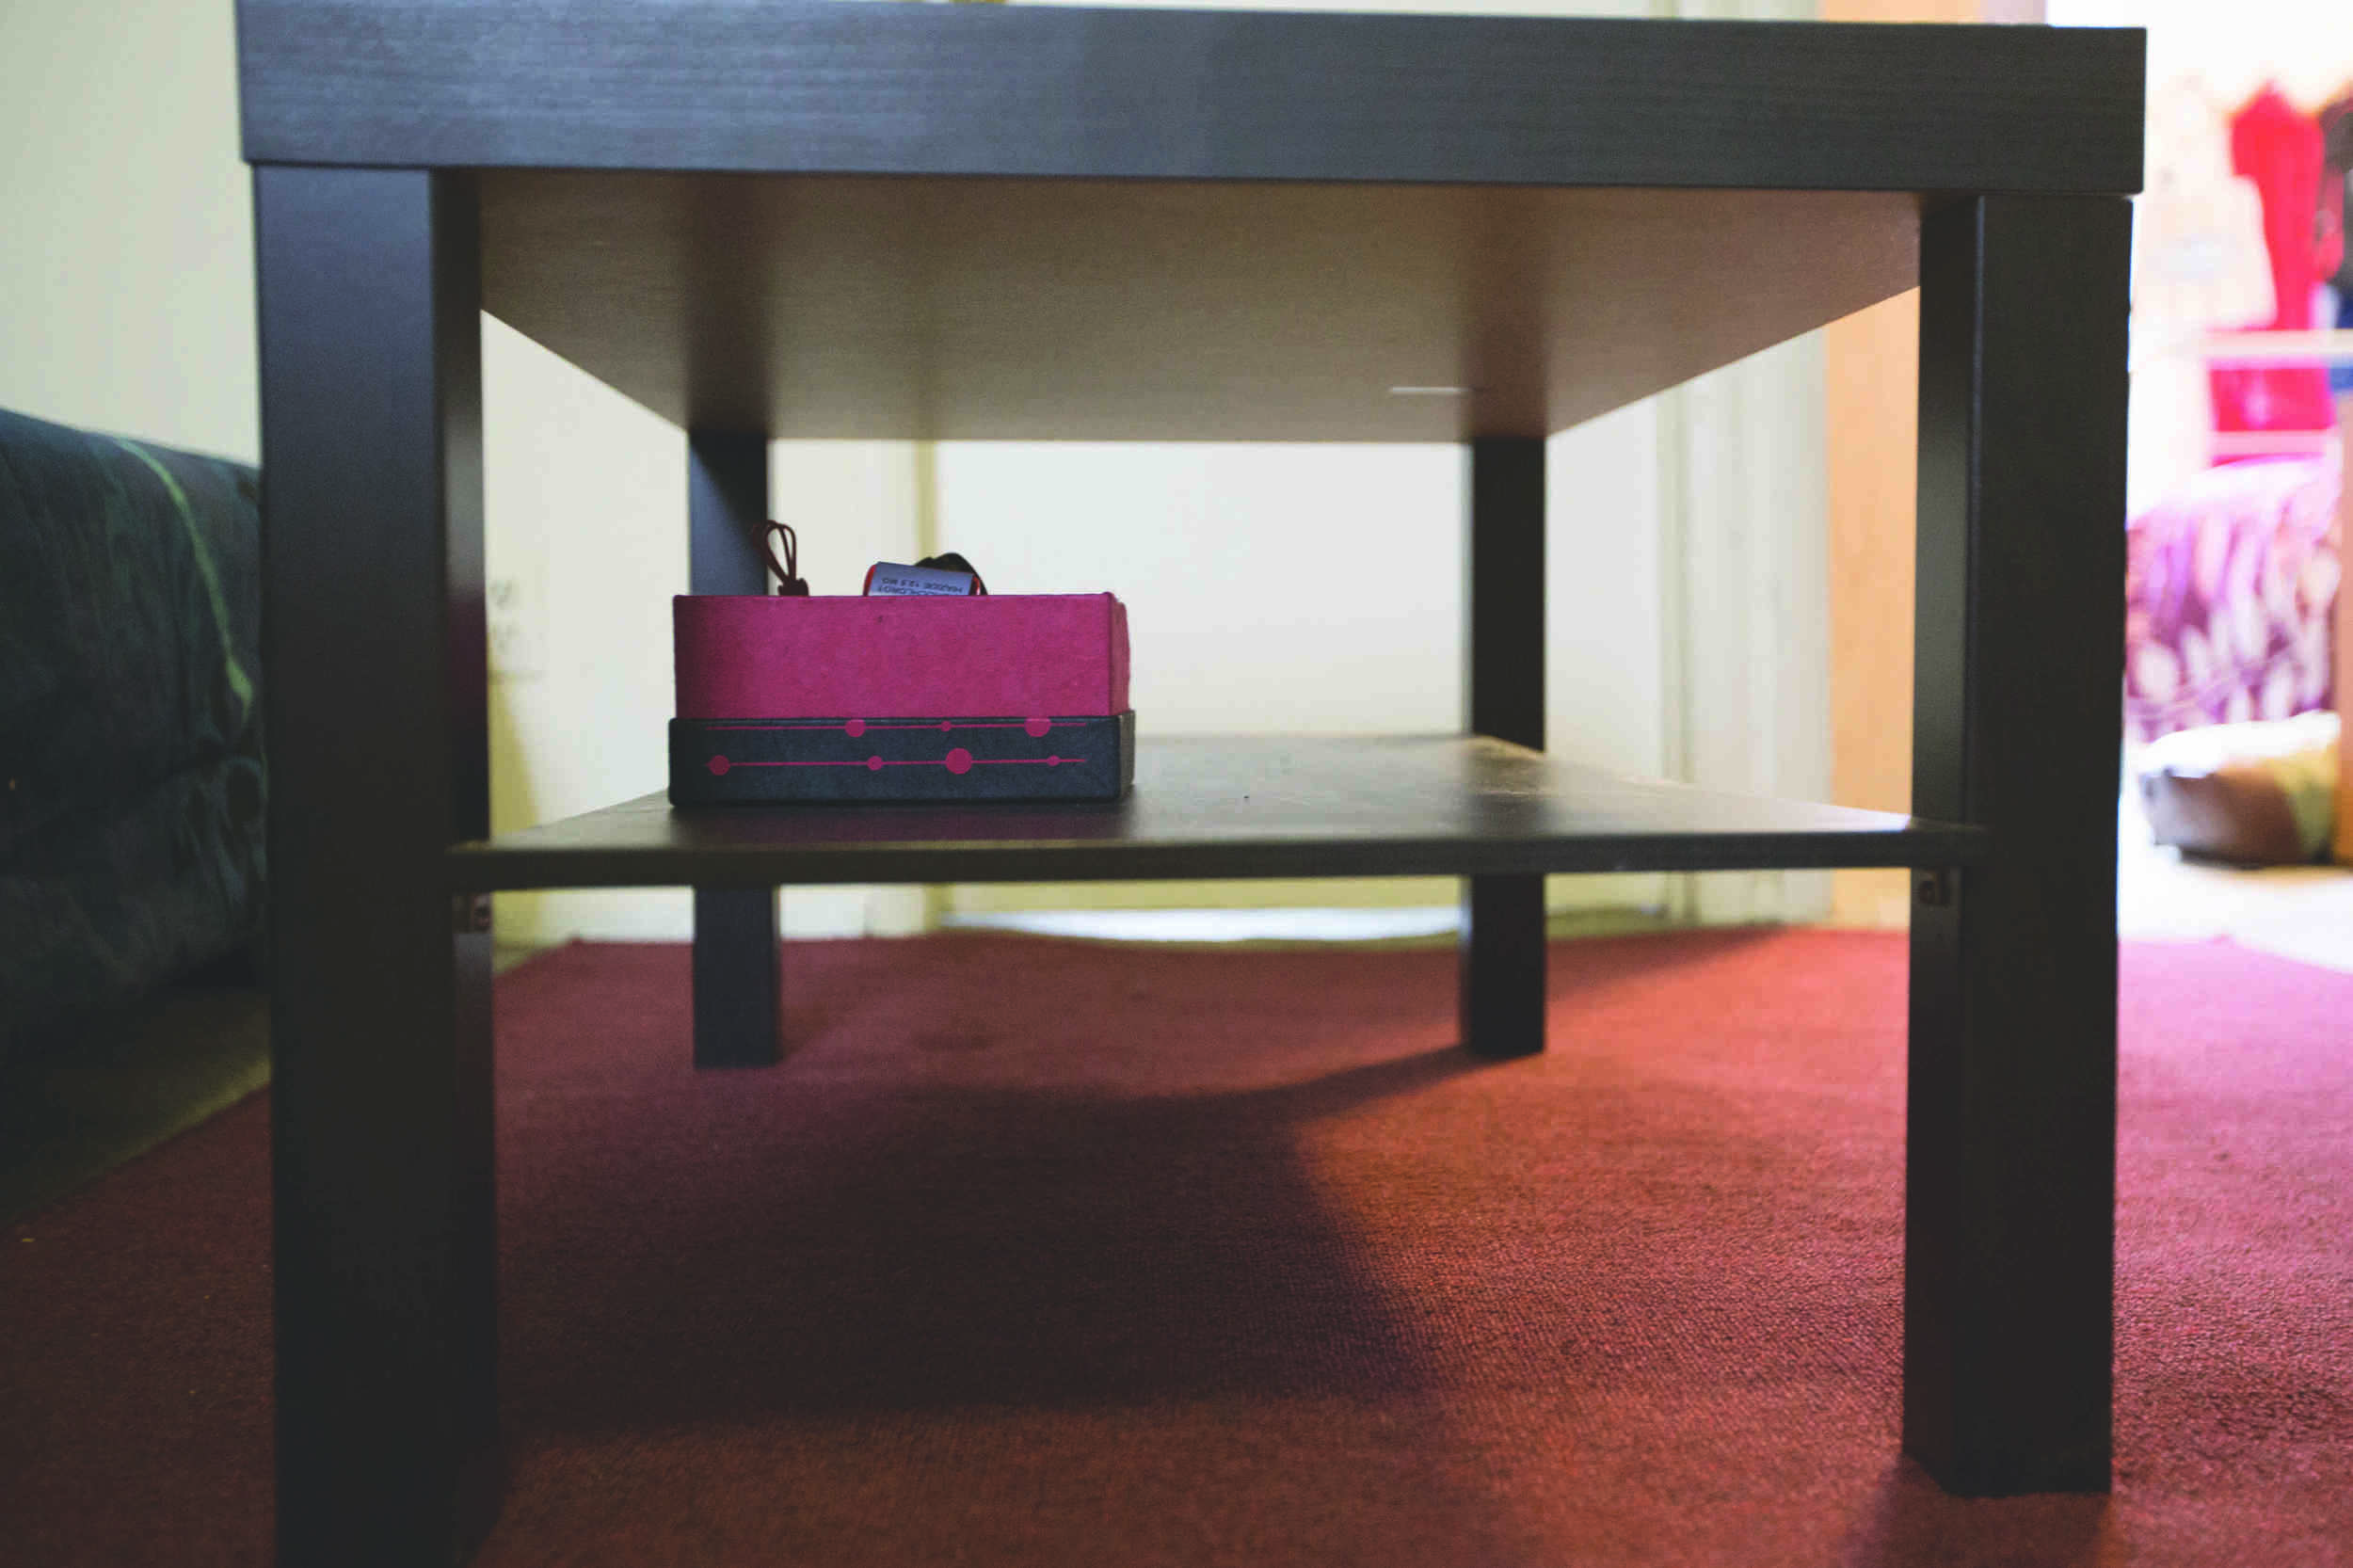 Susan Corcoran's living room furnishings.